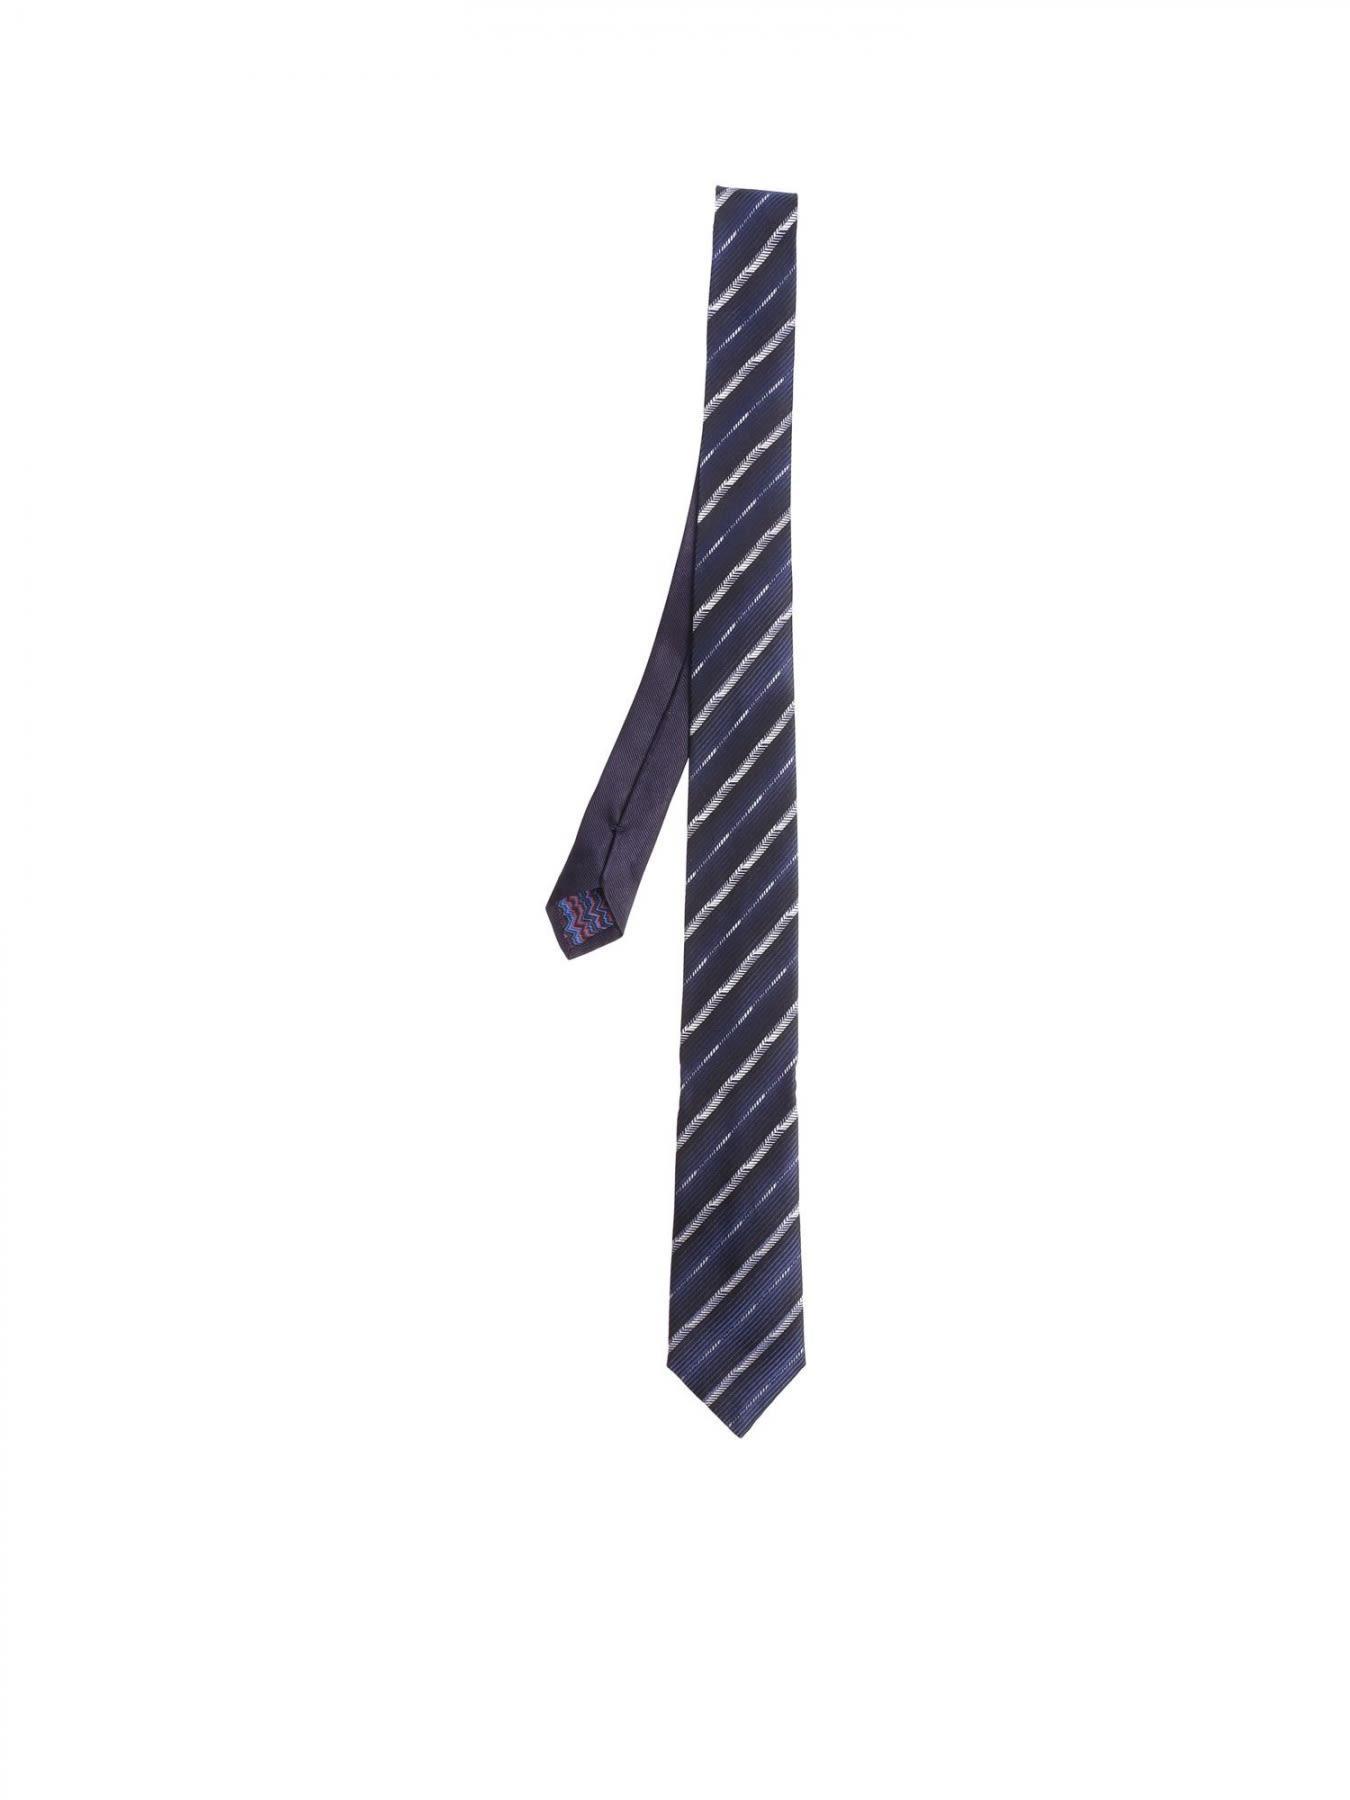 Missoni Wool And Silk Tie In Blue